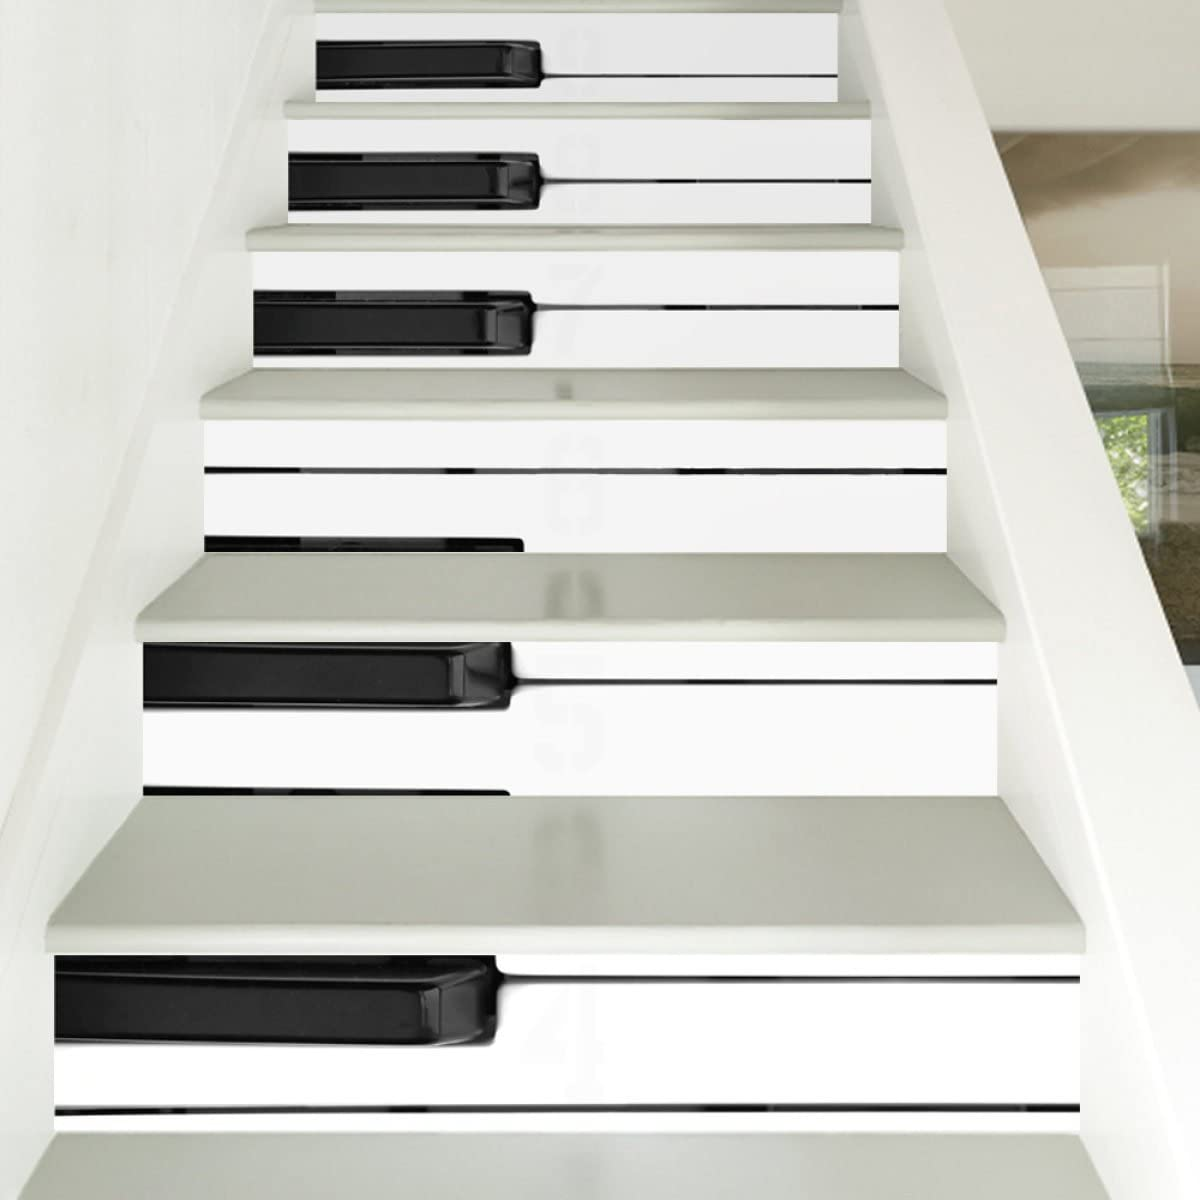 QTZS Escalera 3D Blanco Y Negro Teclas del Piano Escalera Decorativa Impermeable Pegatinas 6 Unids: Amazon.es: Hogar